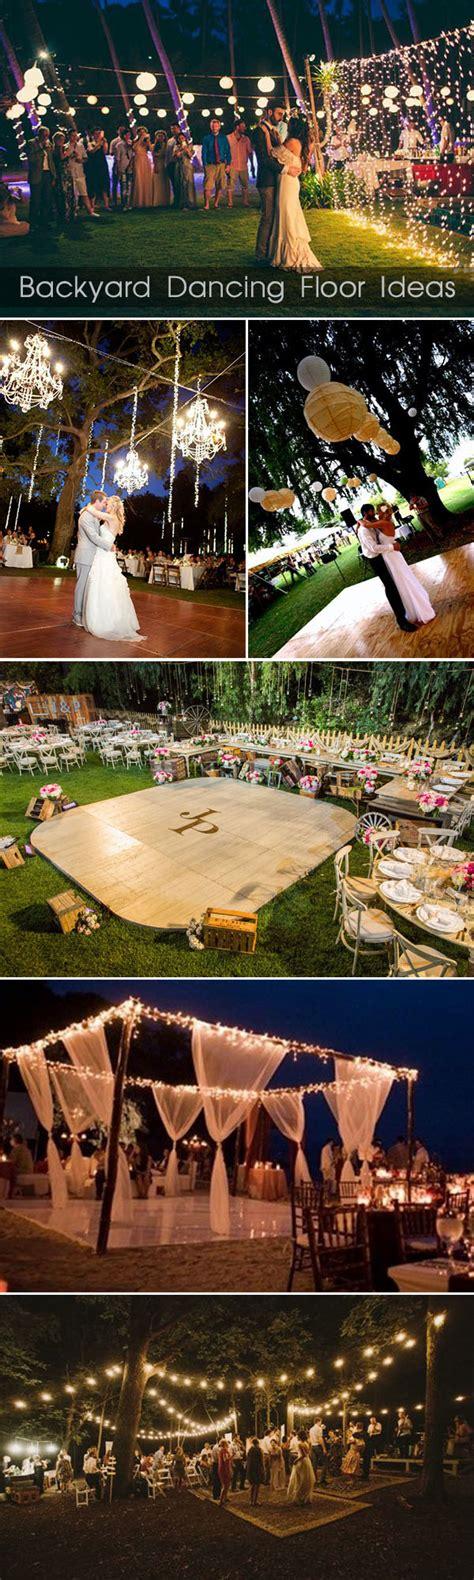 backyard floor ideas 30 sweet ideas for intimate backyard outdoor weddings